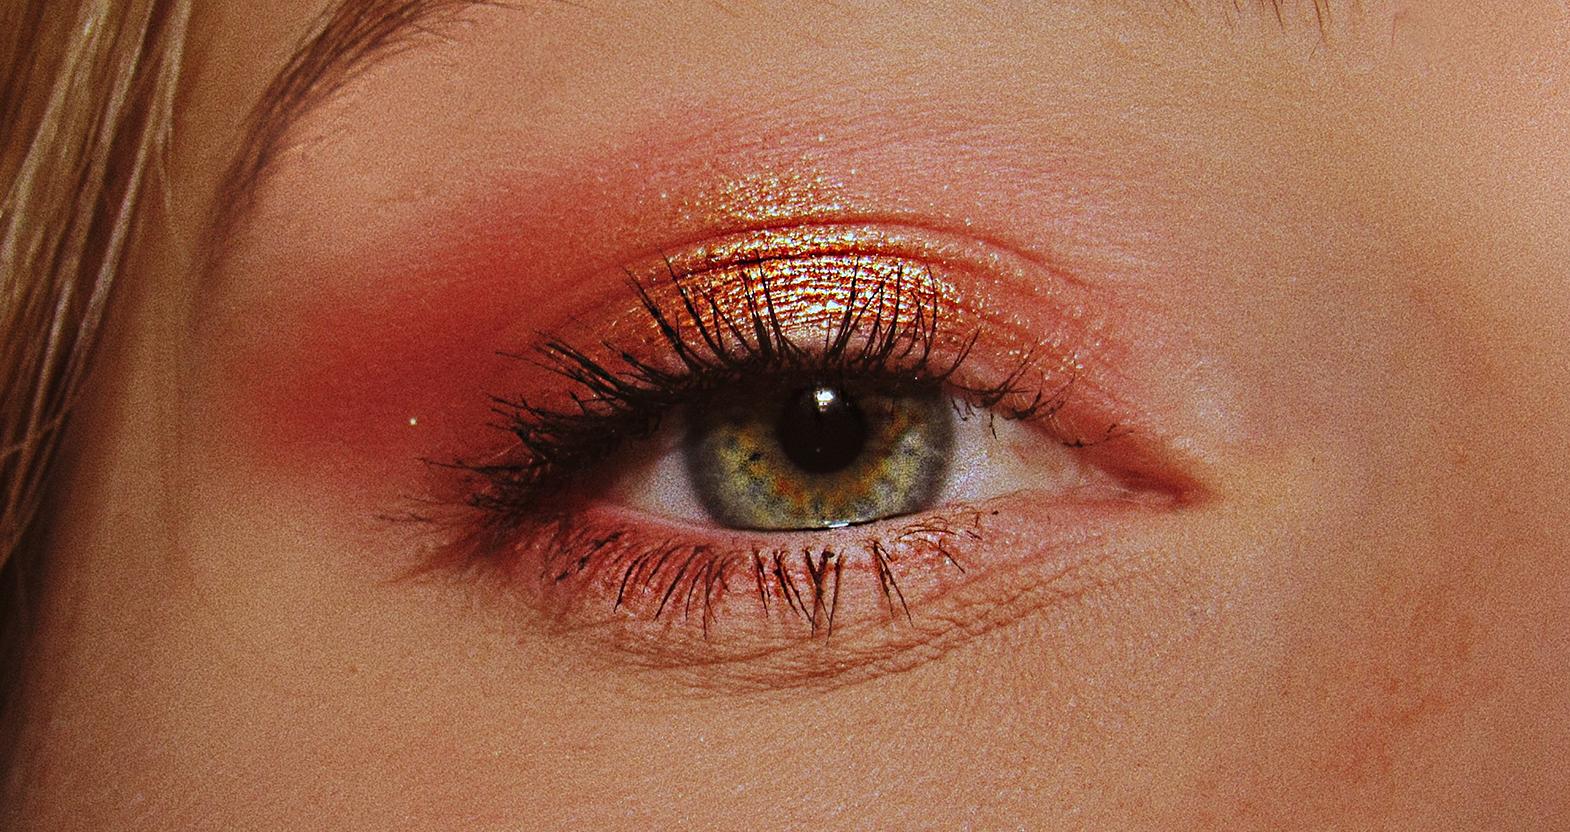 Best Eye Makeup For Sensitive Eyes